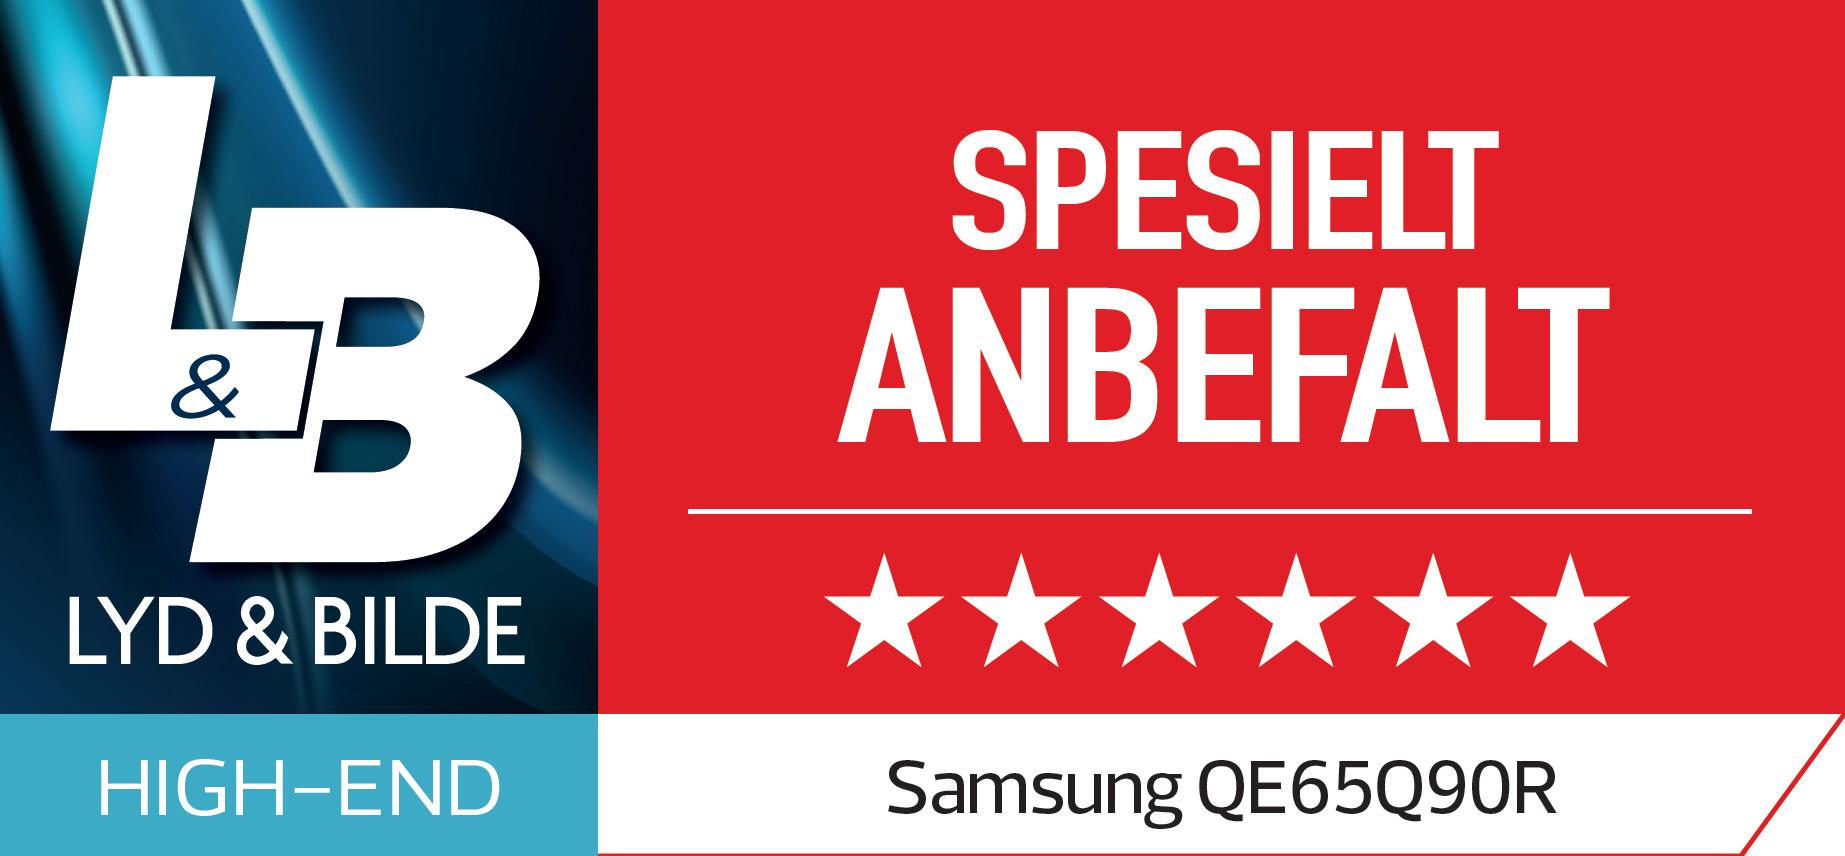 Samsung Q90 - Anbefalt Lyd og bilde